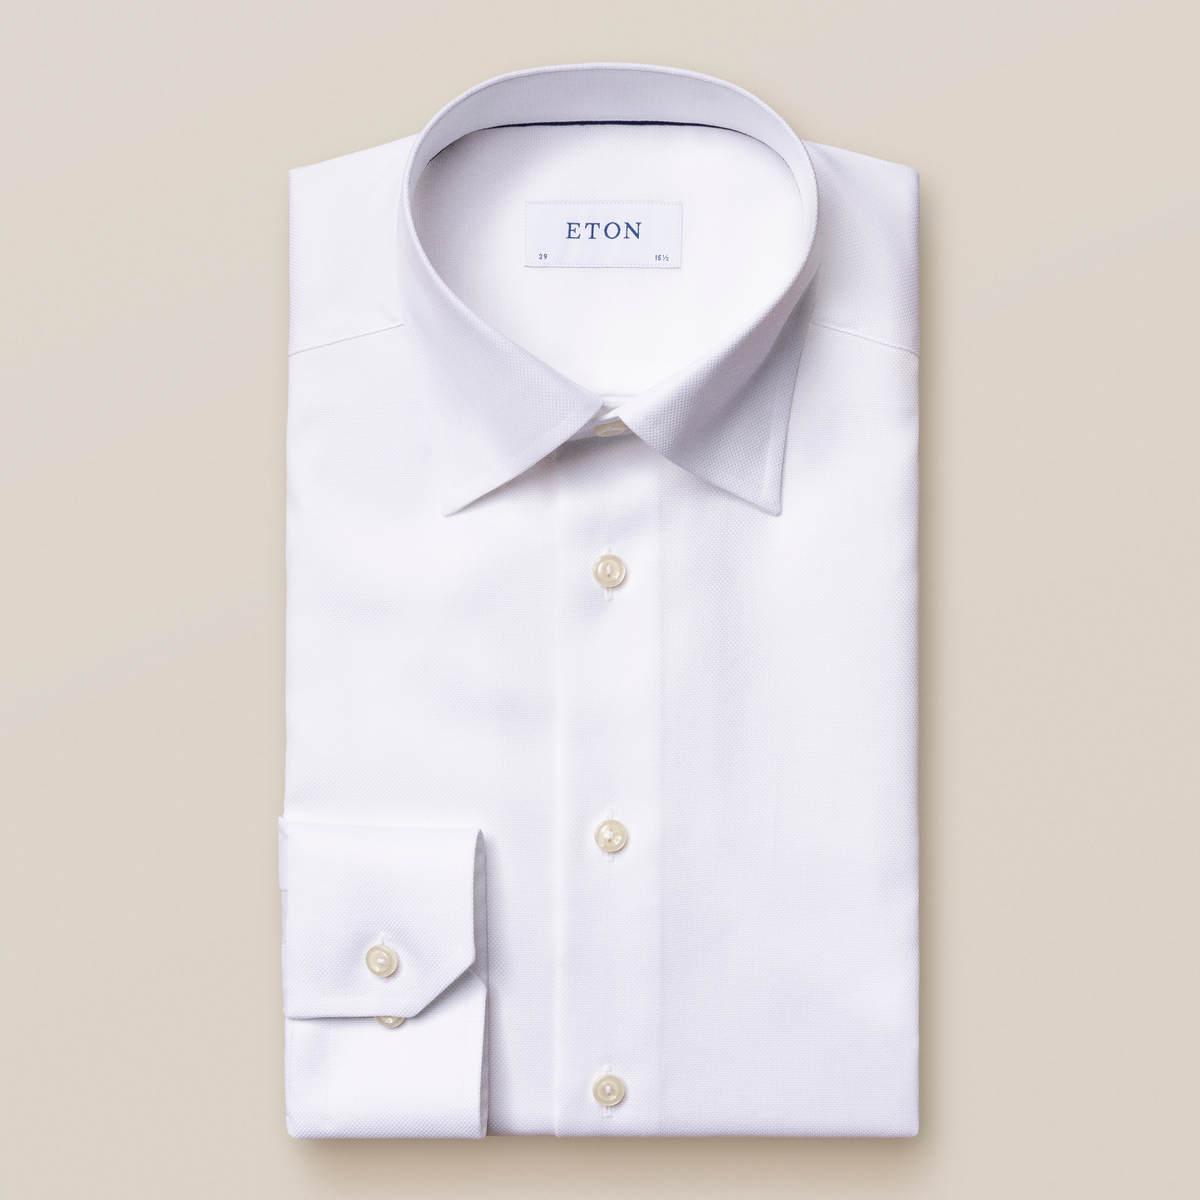 Vit Royal Oxford-skjorta